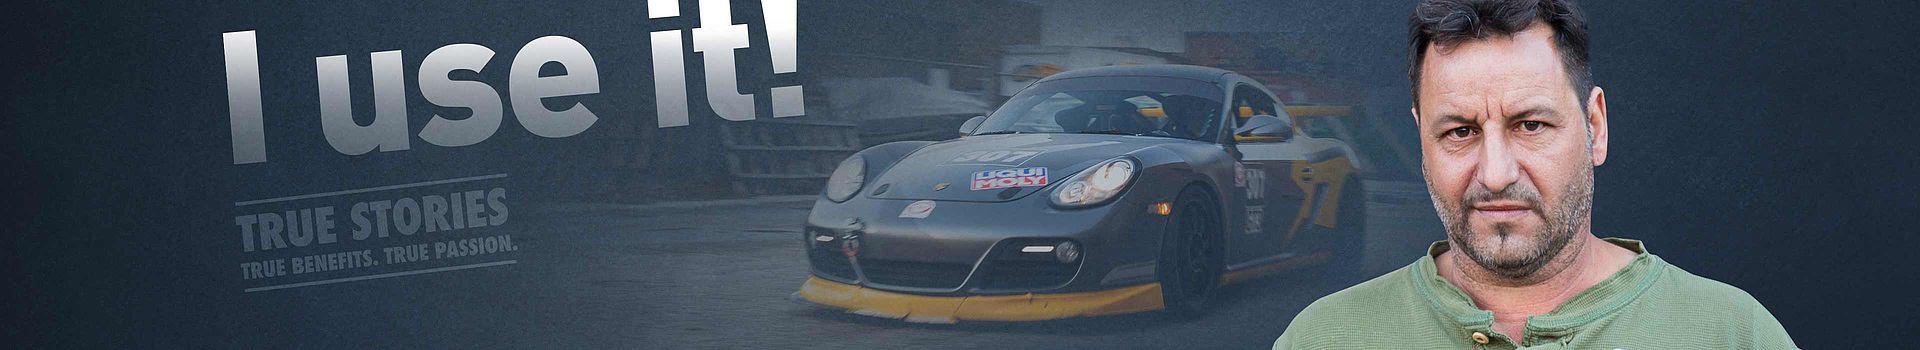 Technical Engineer at Porsche workshop and LIQUI MOLY testimonial. Bestline Auto Tech